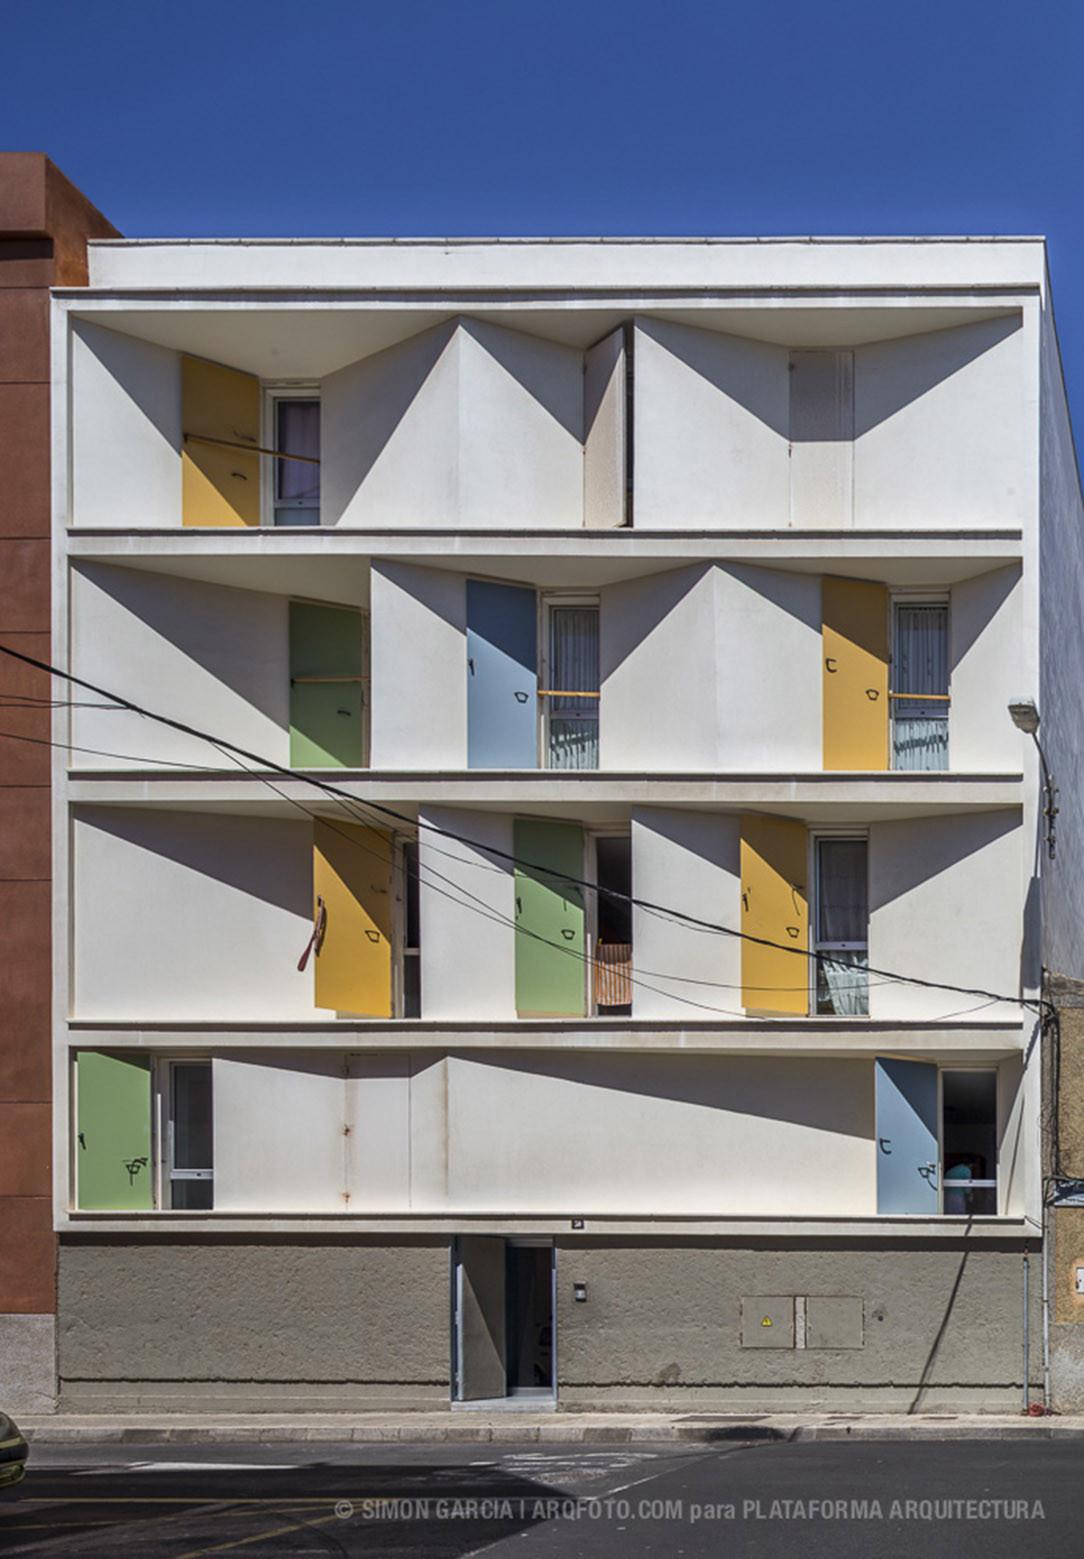 Gallery of 8 inscribed houses and three courtyards - Garcia ruiz arquitectos ...